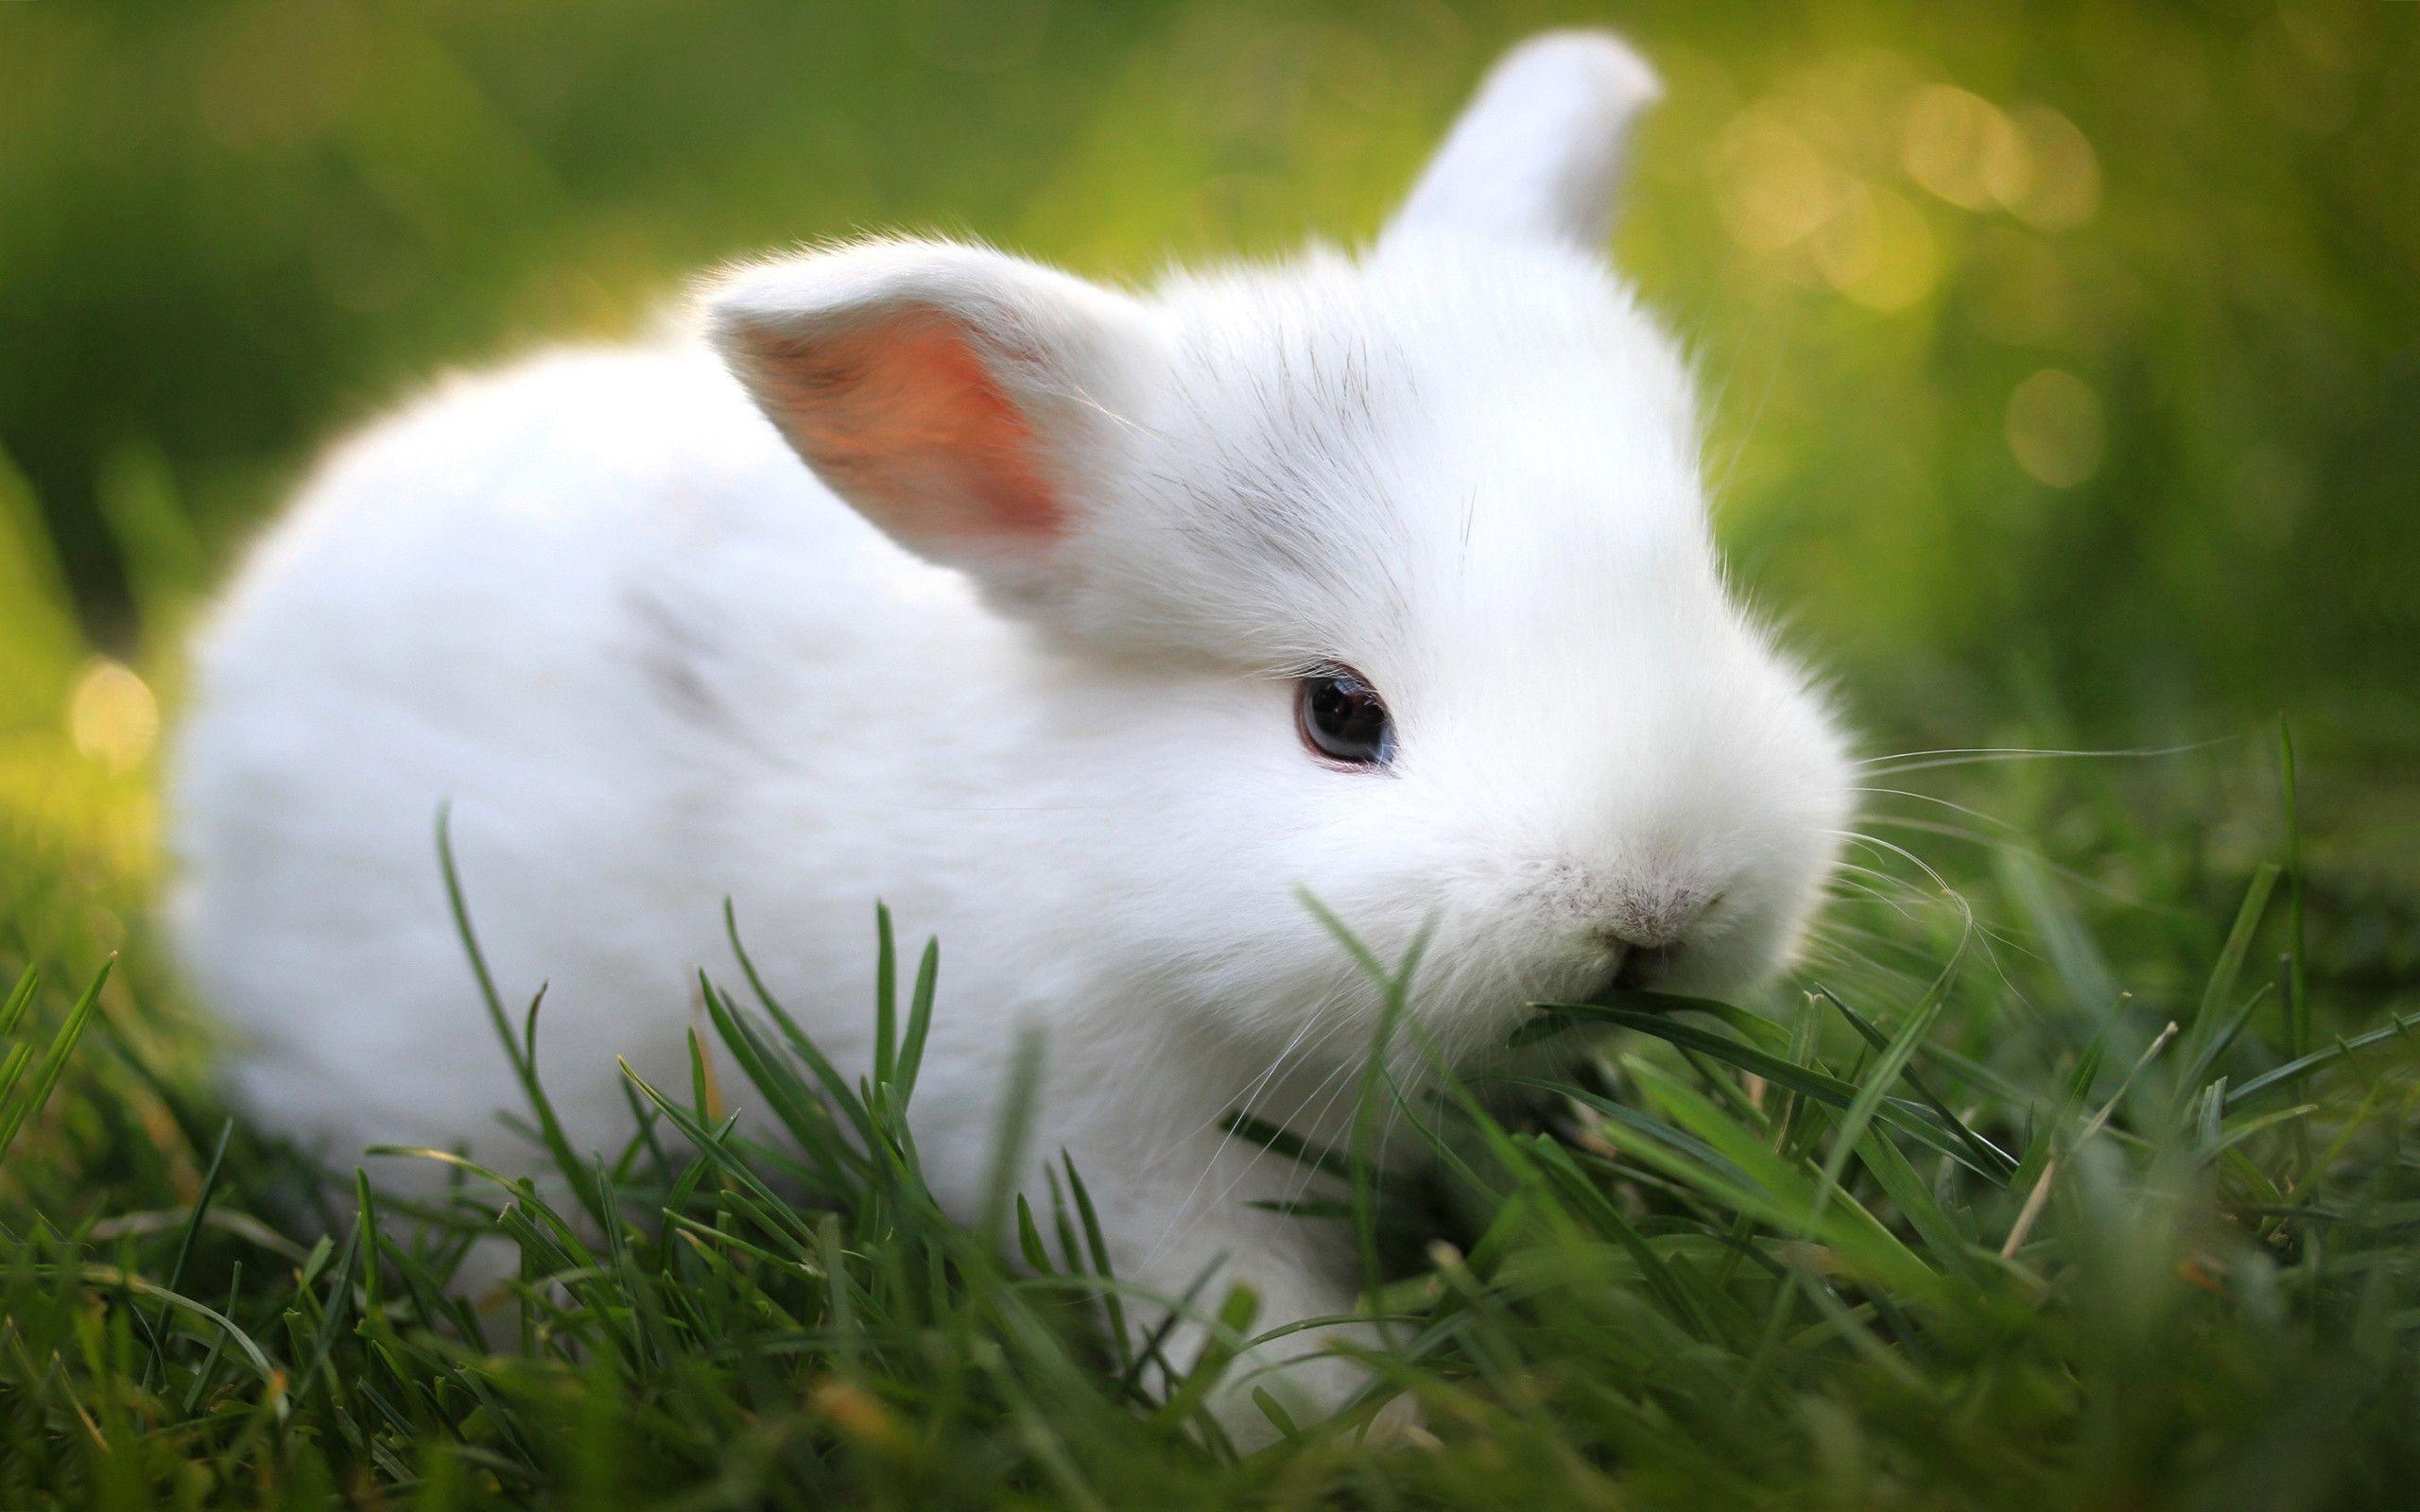 Cute White Bunny Wallpaper 39765 in Animals – Telusers.com